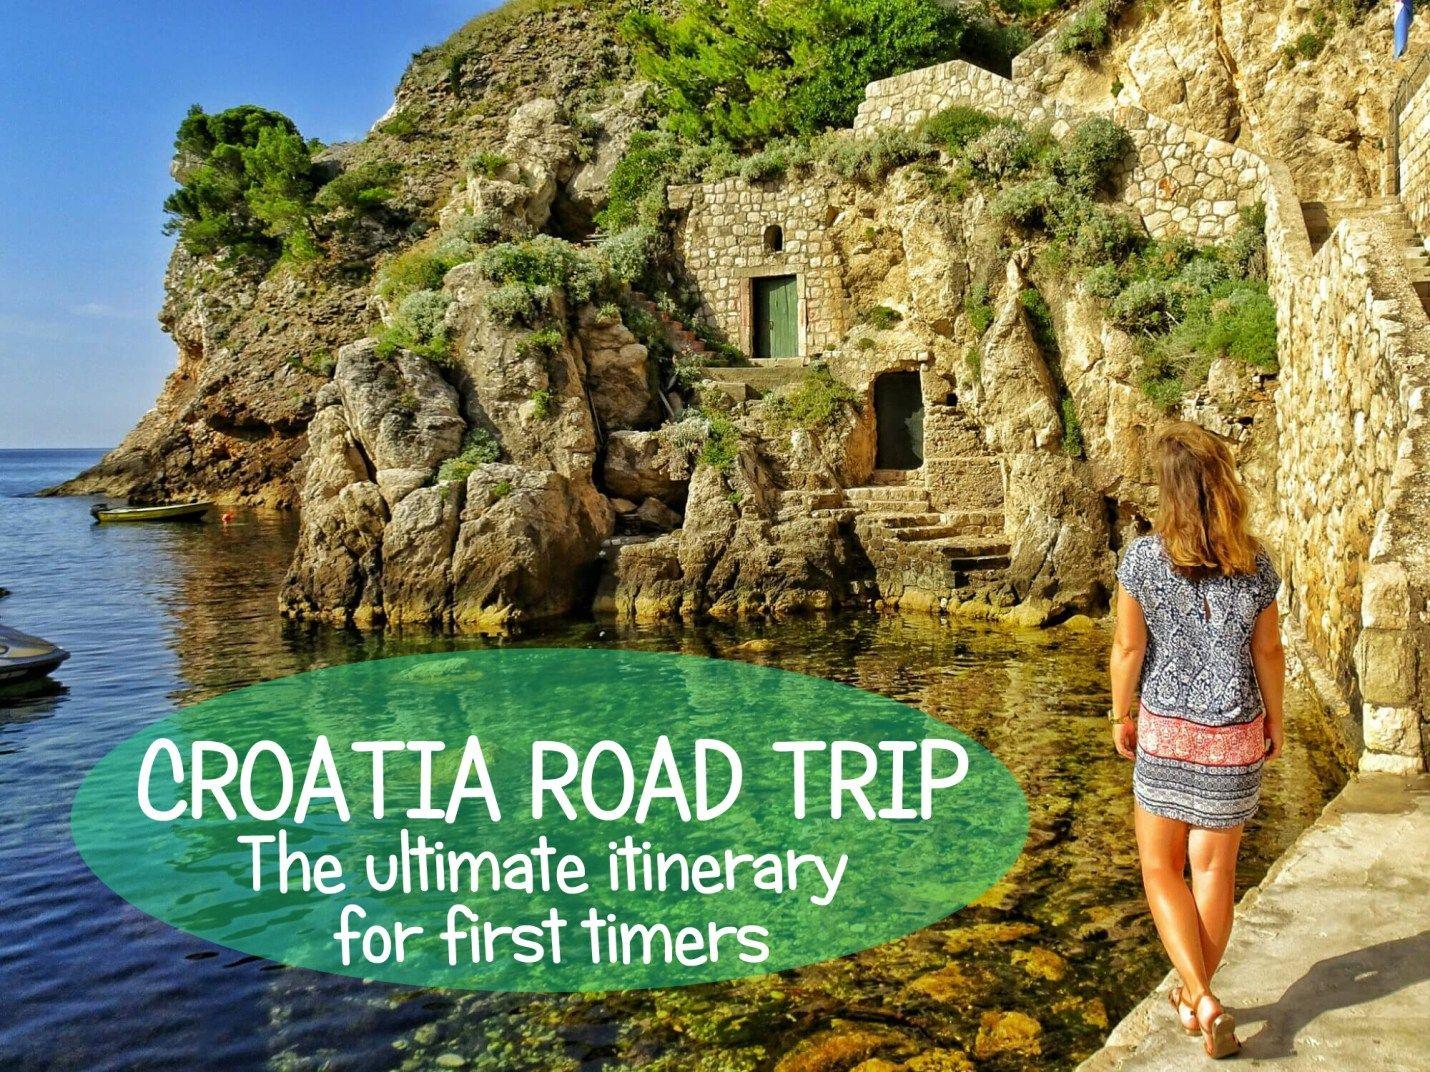 Croatia Roadtrip Itinerary Road Trip Croatia Travel Road Trip Itinerary